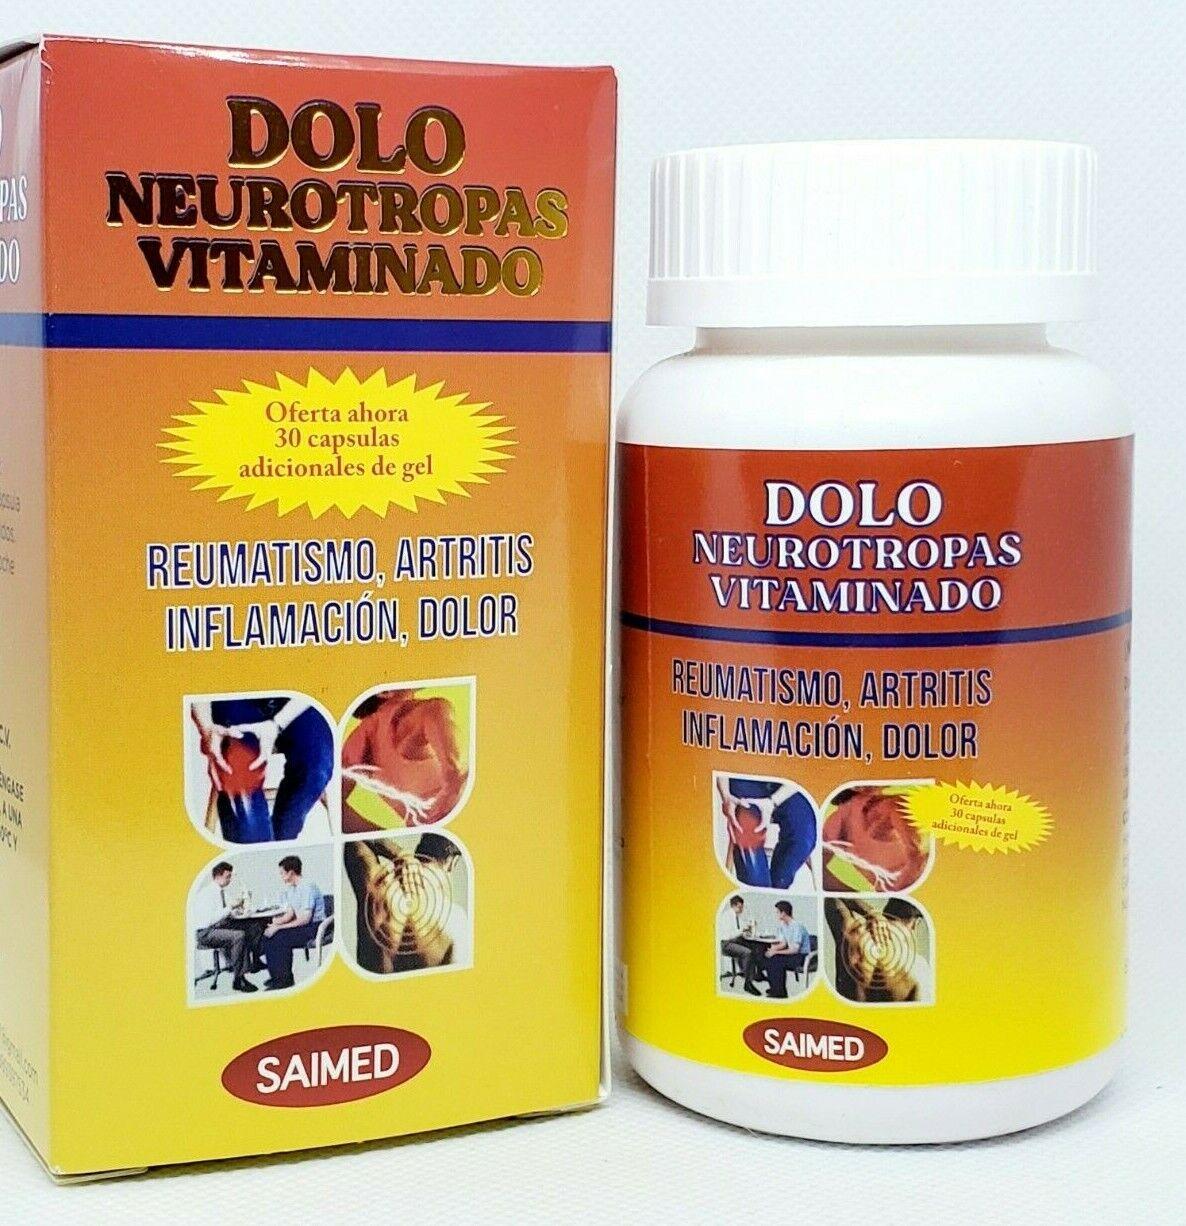 Dolo Neurotropas Vitaminado Complejo B Joint Pain 30 Softgels 06/2026 Complex B